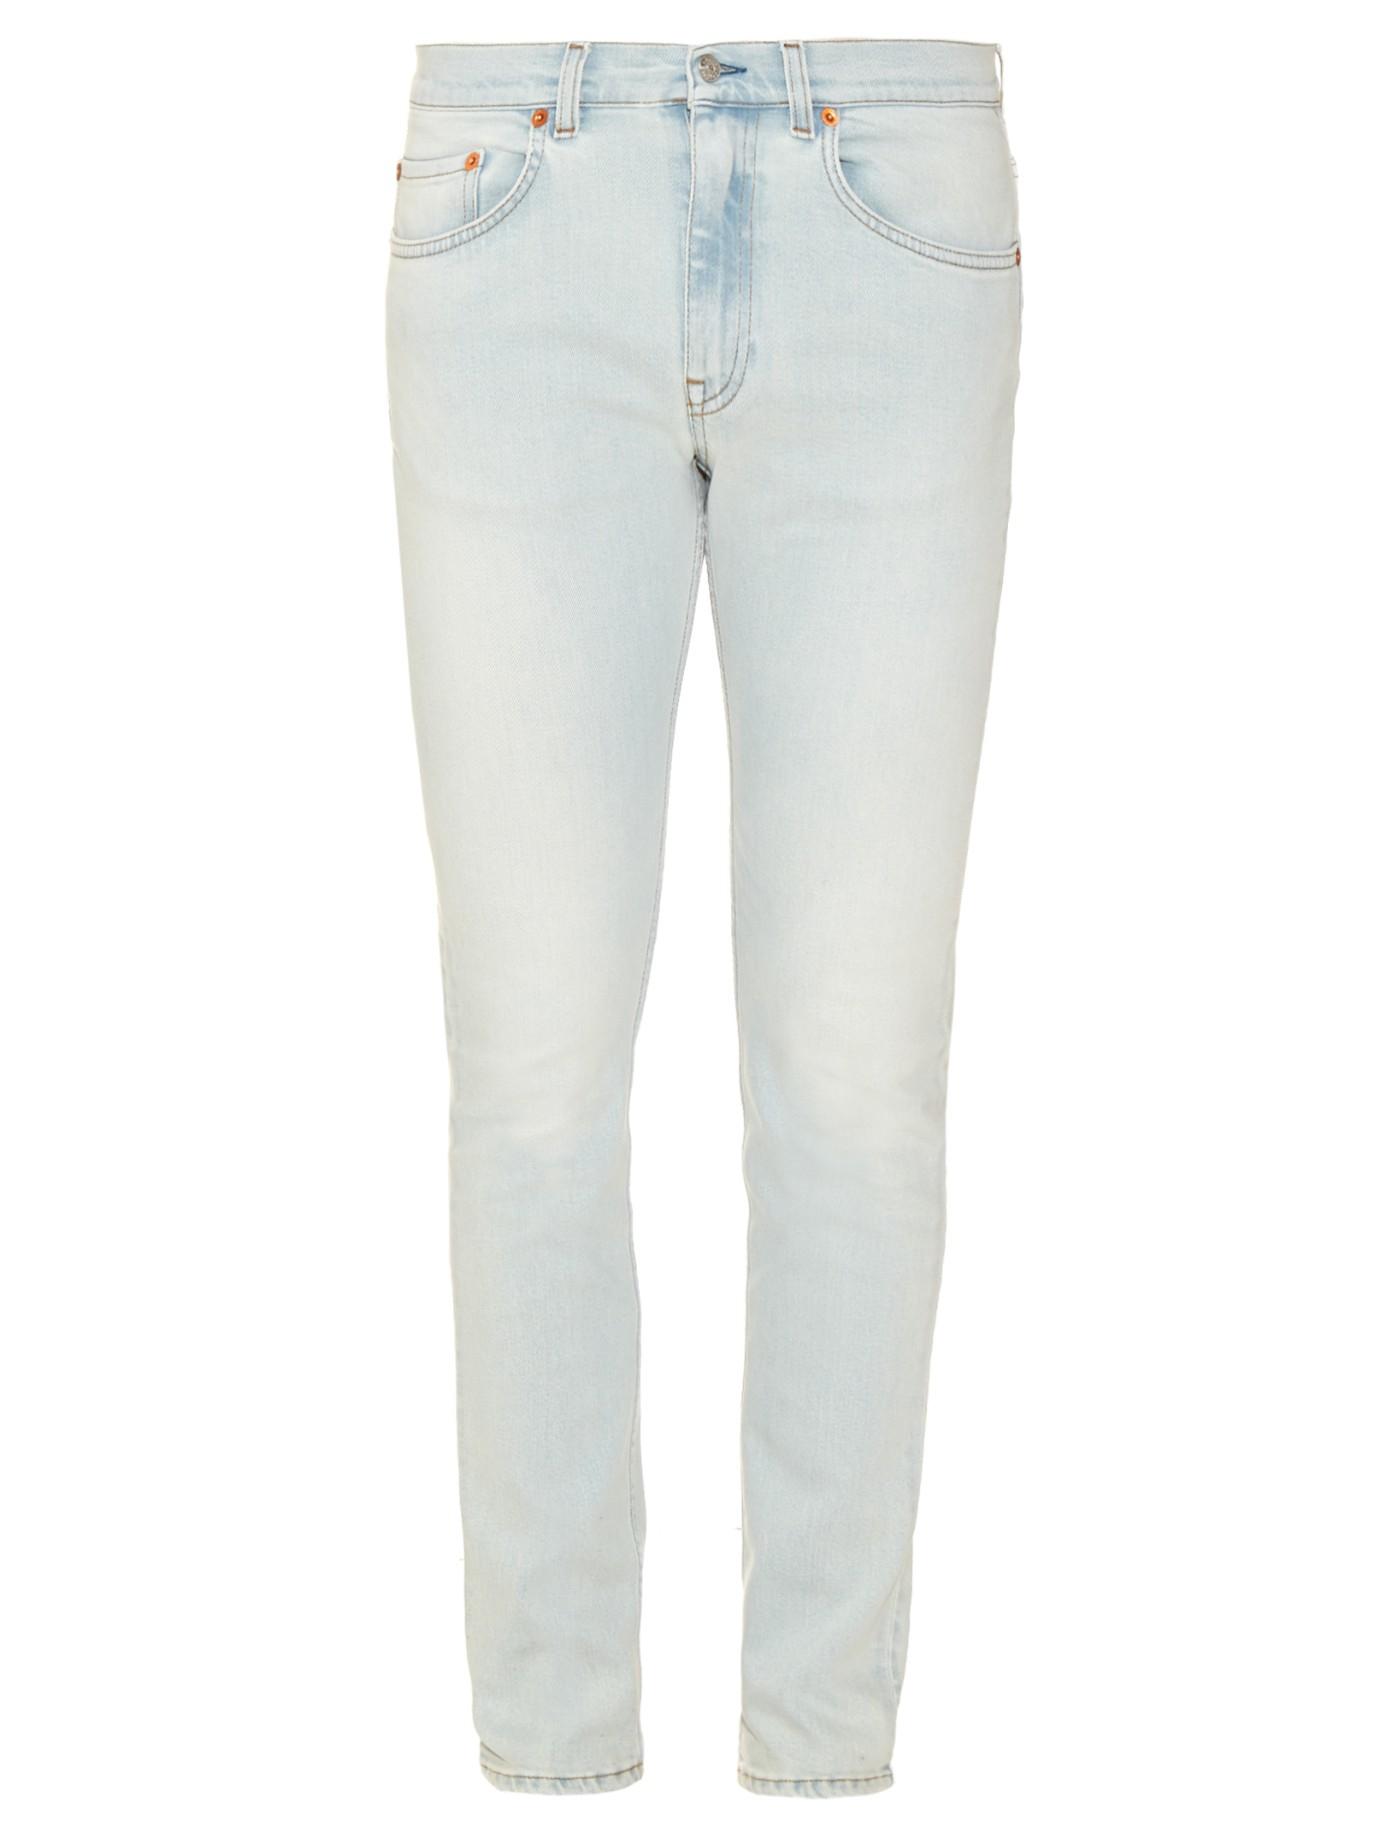 Acne Studios Ace Bleach Skinny Jeans In Blue For Men Lyst